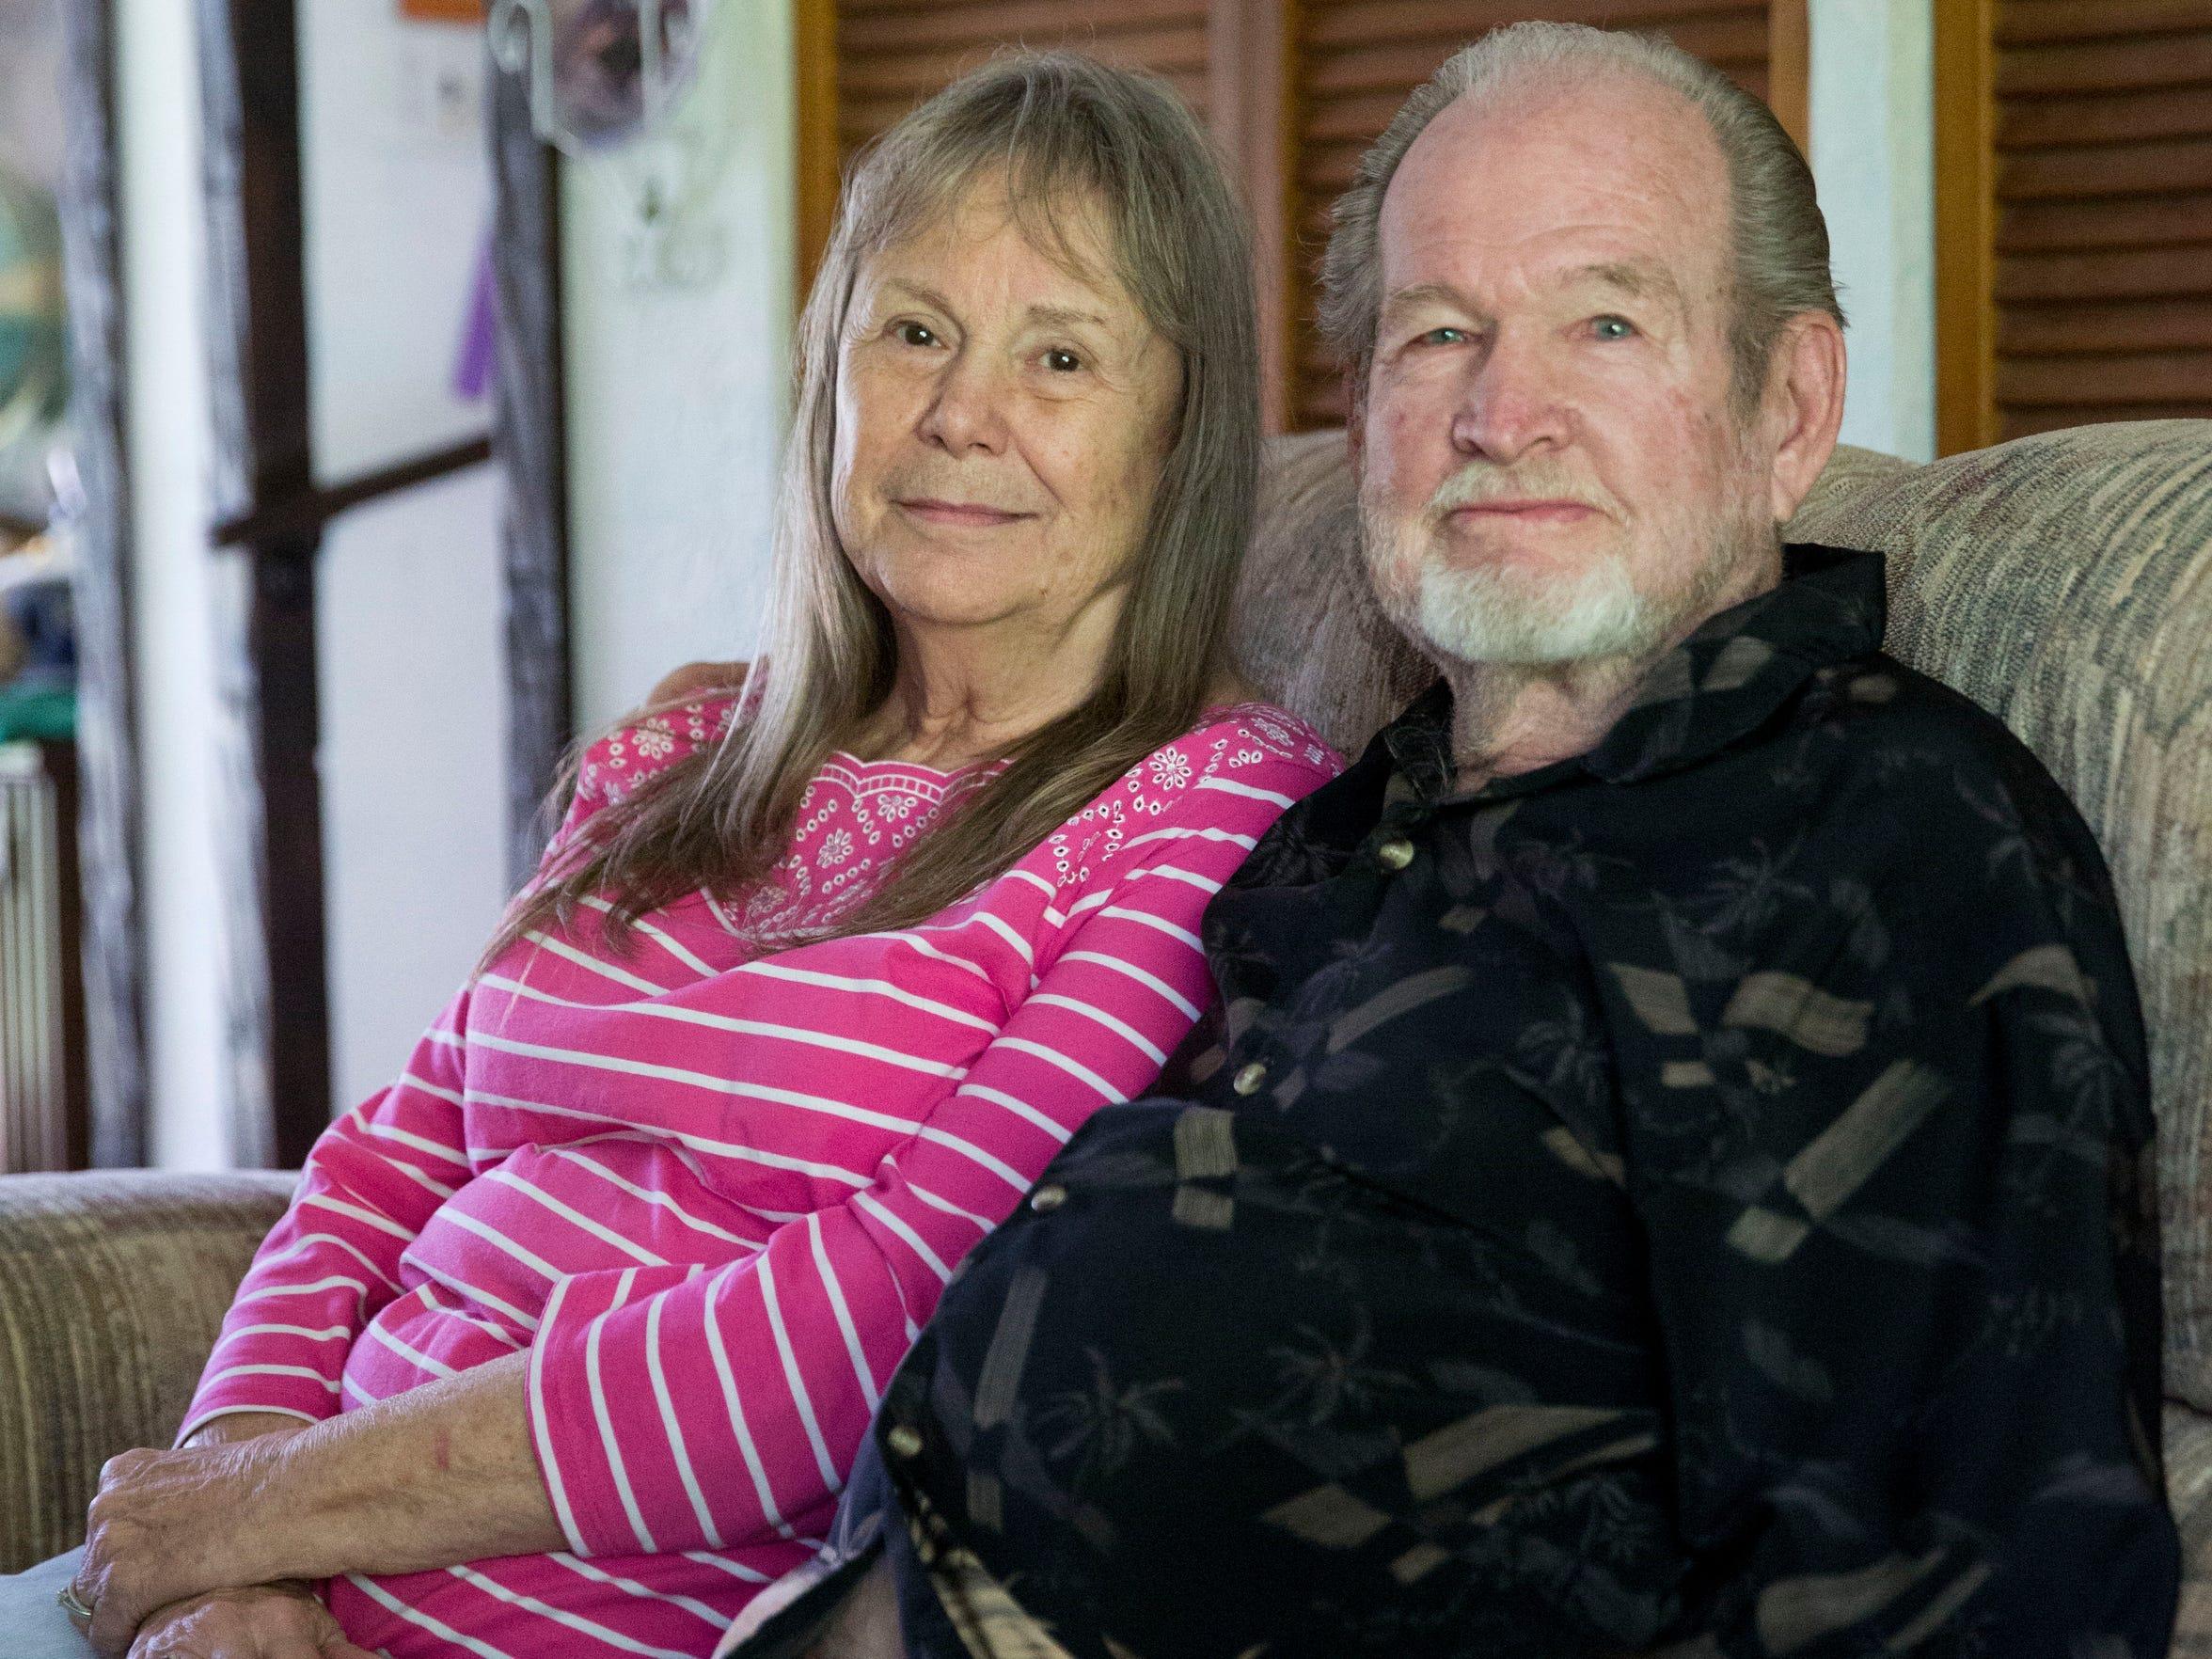 Earlene Calloway, 77, and her husband Bill Bearden,